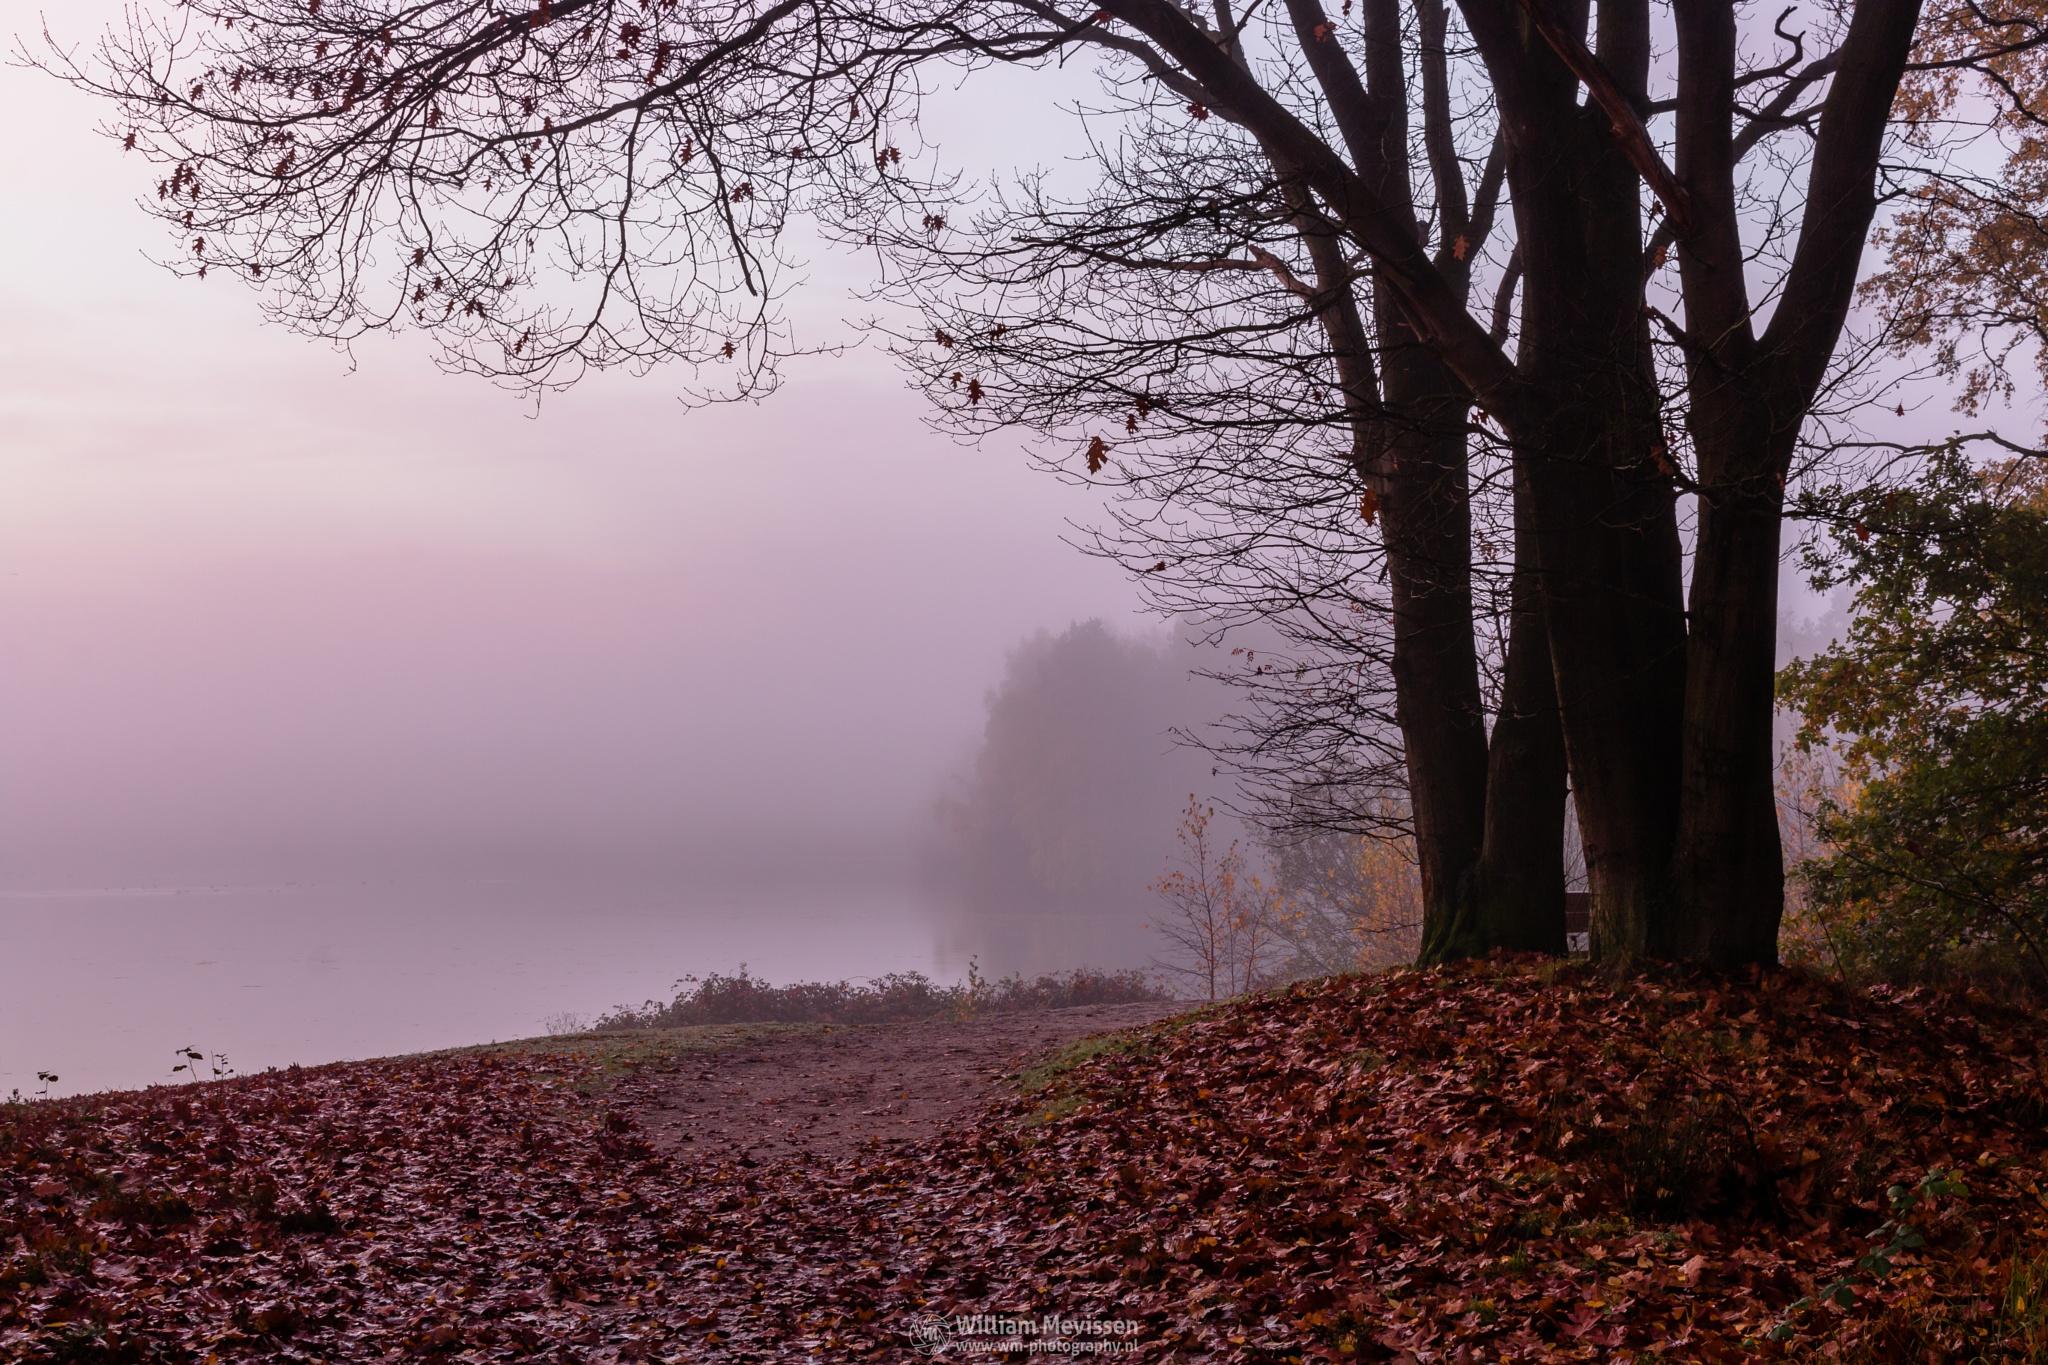 Misty Twilight Tree by William Mevissen